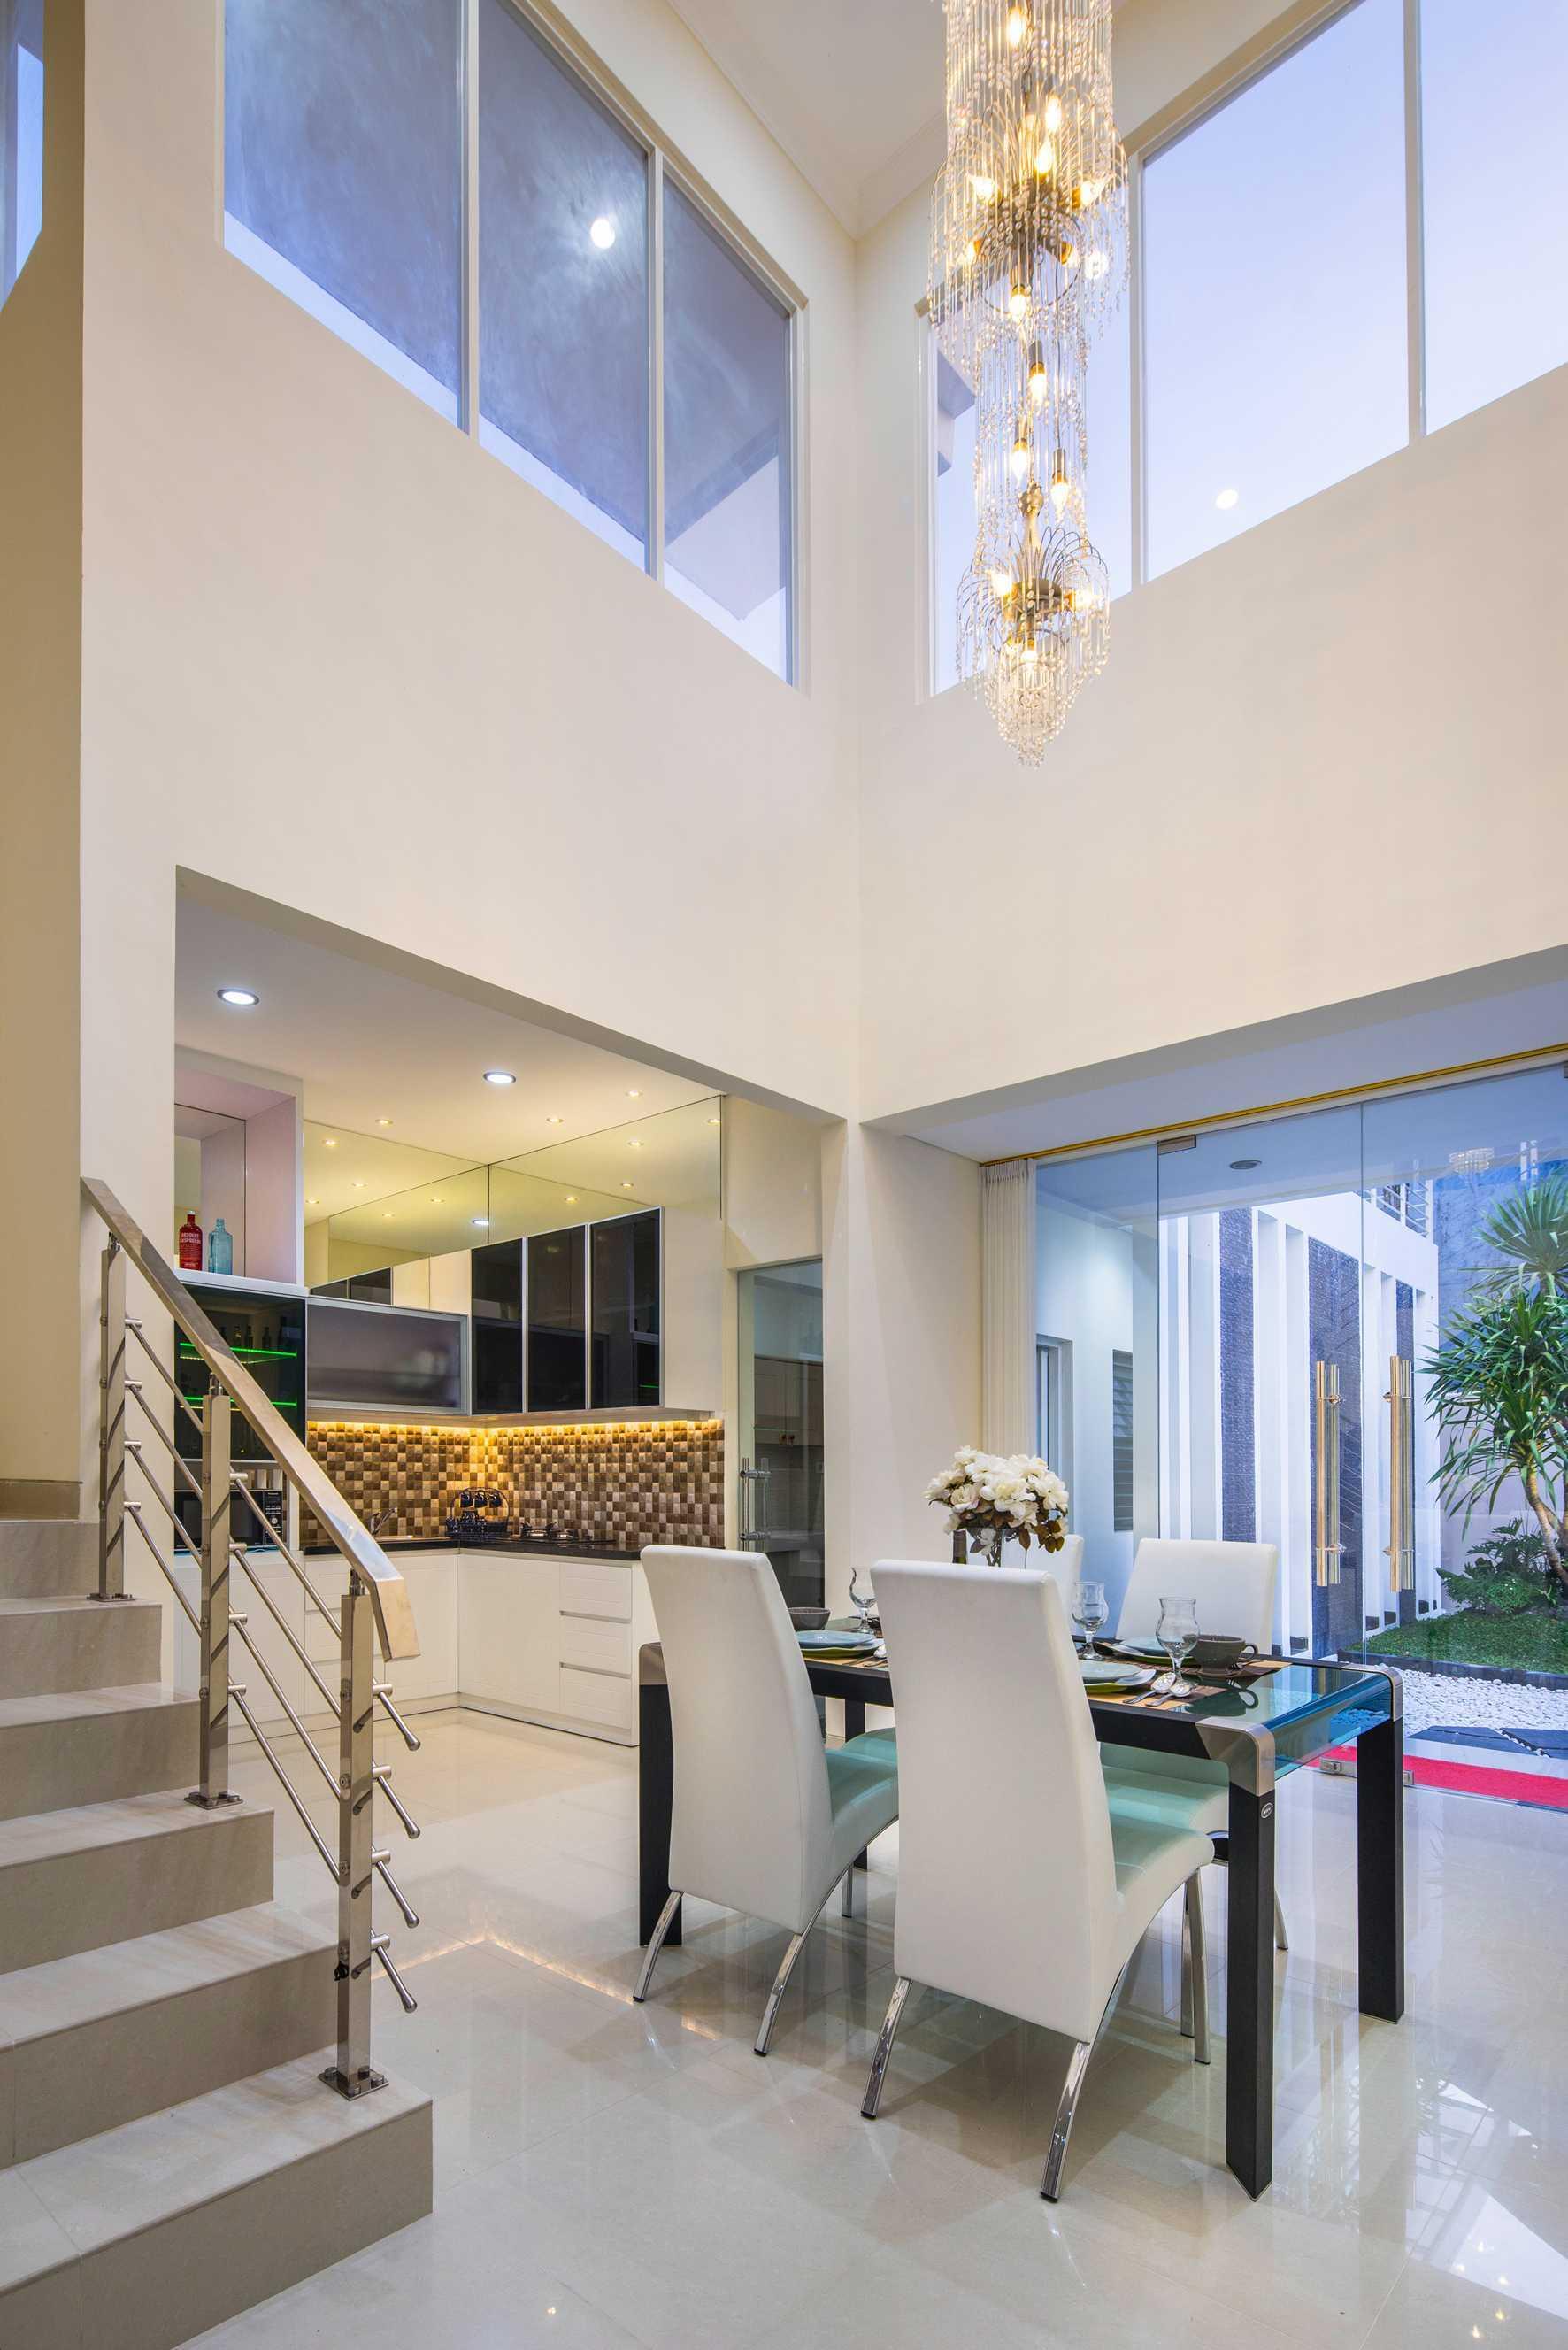 Hausse Interior Modern House Surabaya, Kota Sby, Jawa Timur, Indonesia Surabaya, Kota Sby, Jawa Timur, Indonesia Modern House   75631